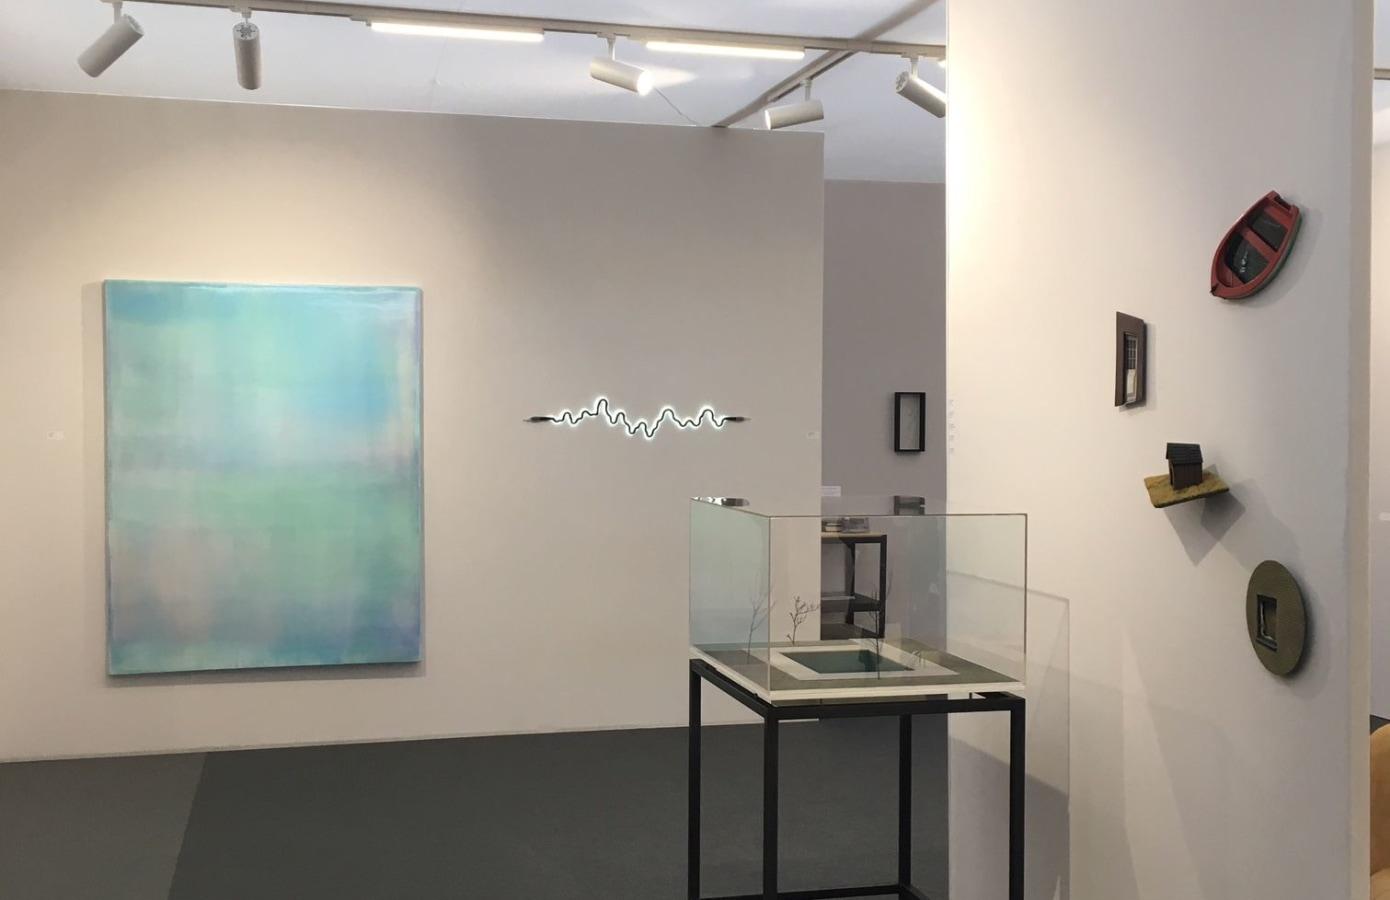 Galerie van den Berge @ PAN Amsterdam, Ingrid van der Hoeven, Jus Juchtmans, Dave Meijer, Jan van Munster, P.B. Van Rossem, Maurice van Tellingen,